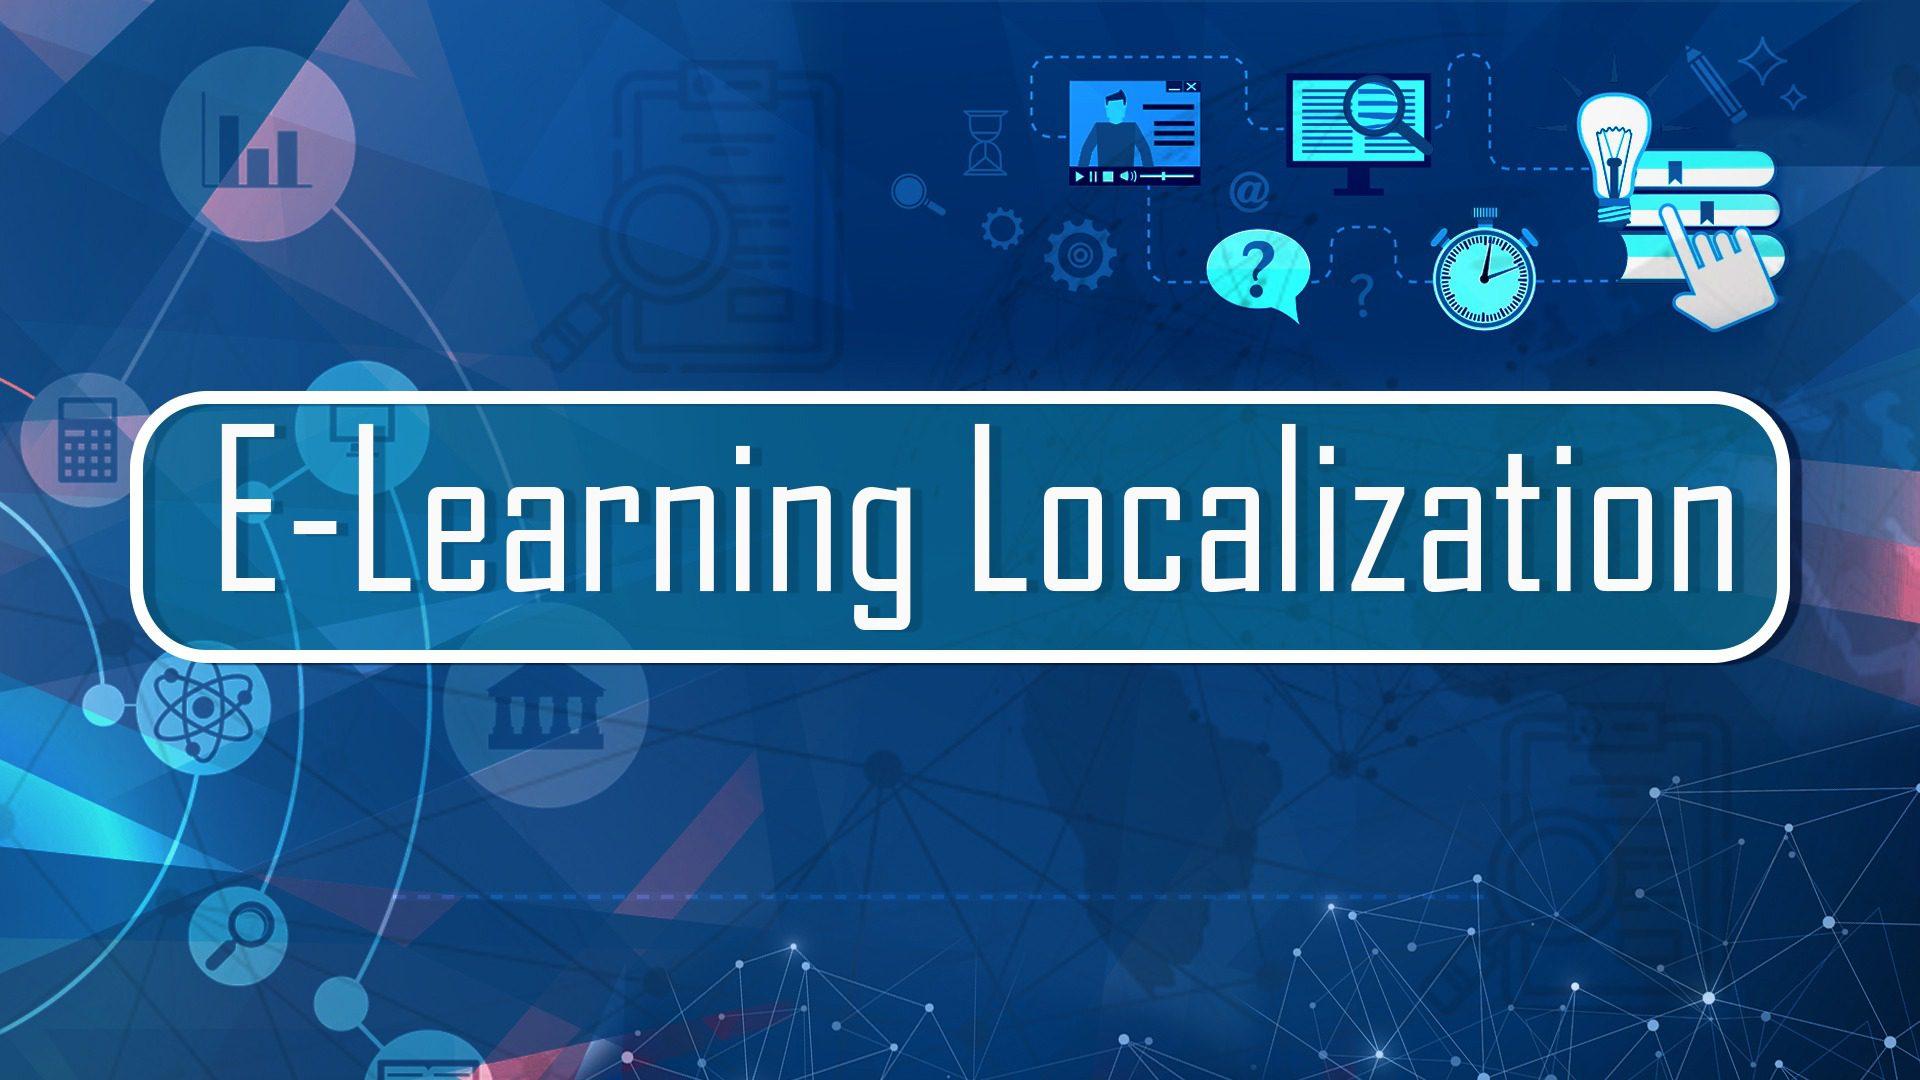 e-learning localization